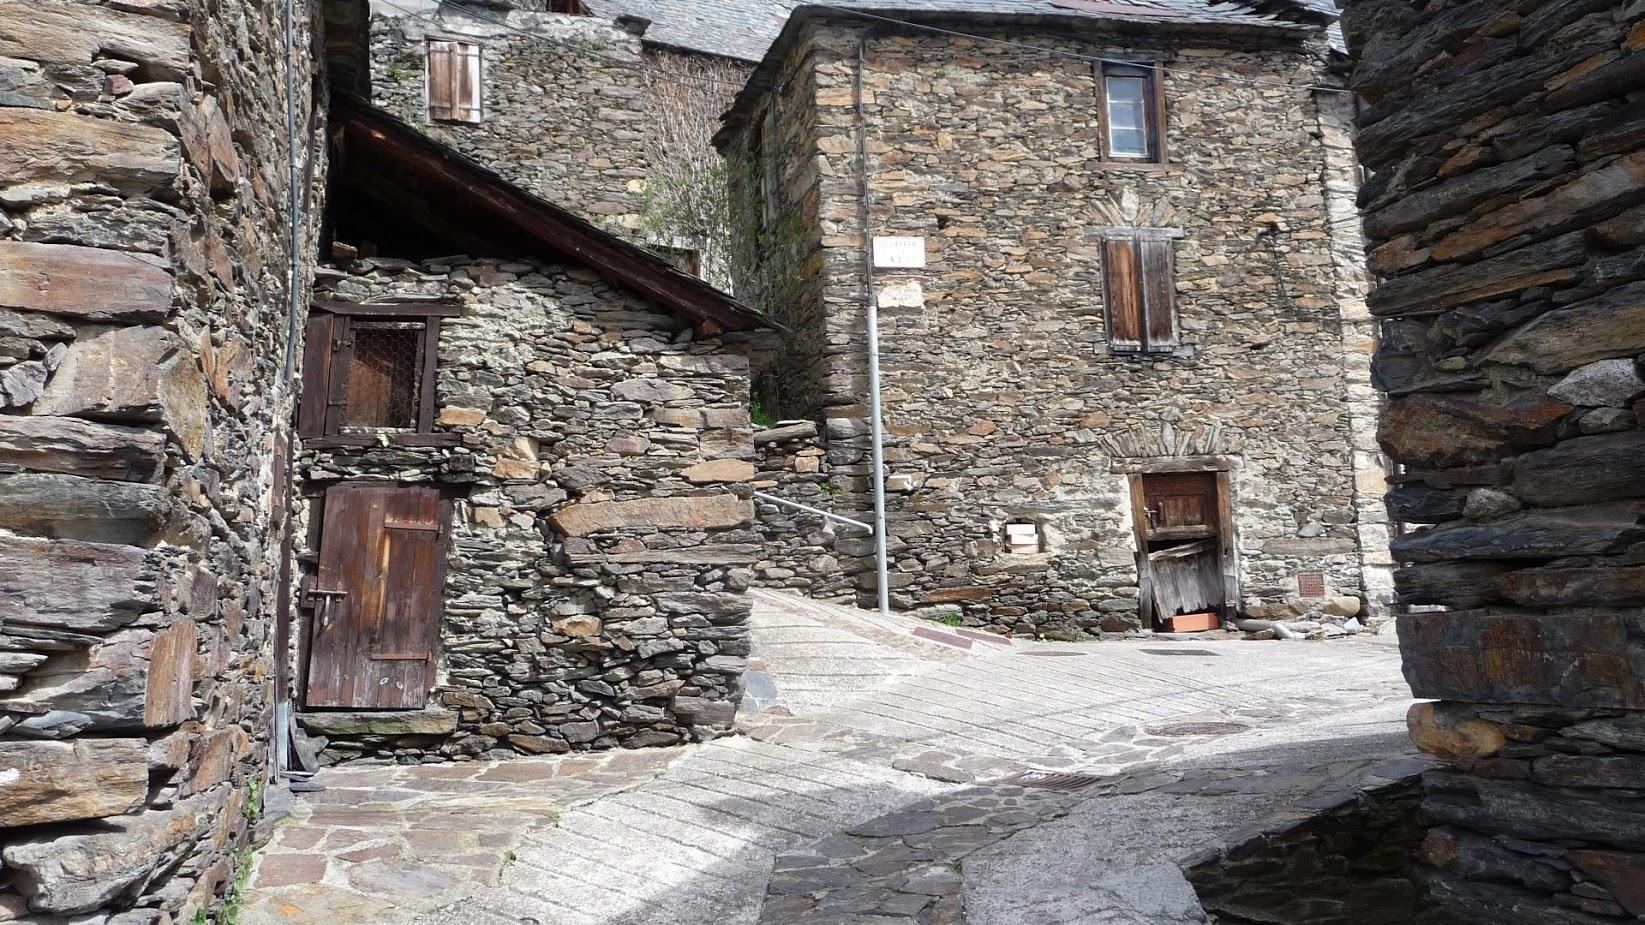 G2 - Bossost Villages Garonne - Claude